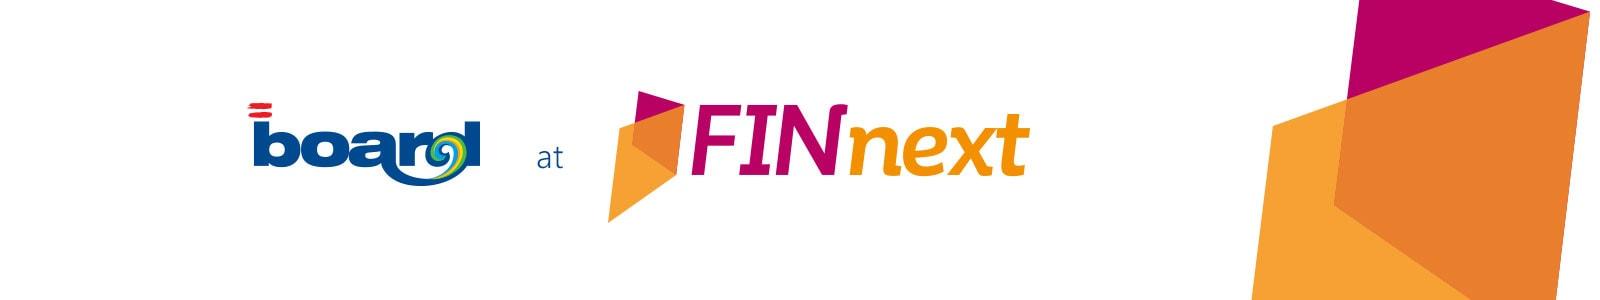 Meet Board at FinNext 2019